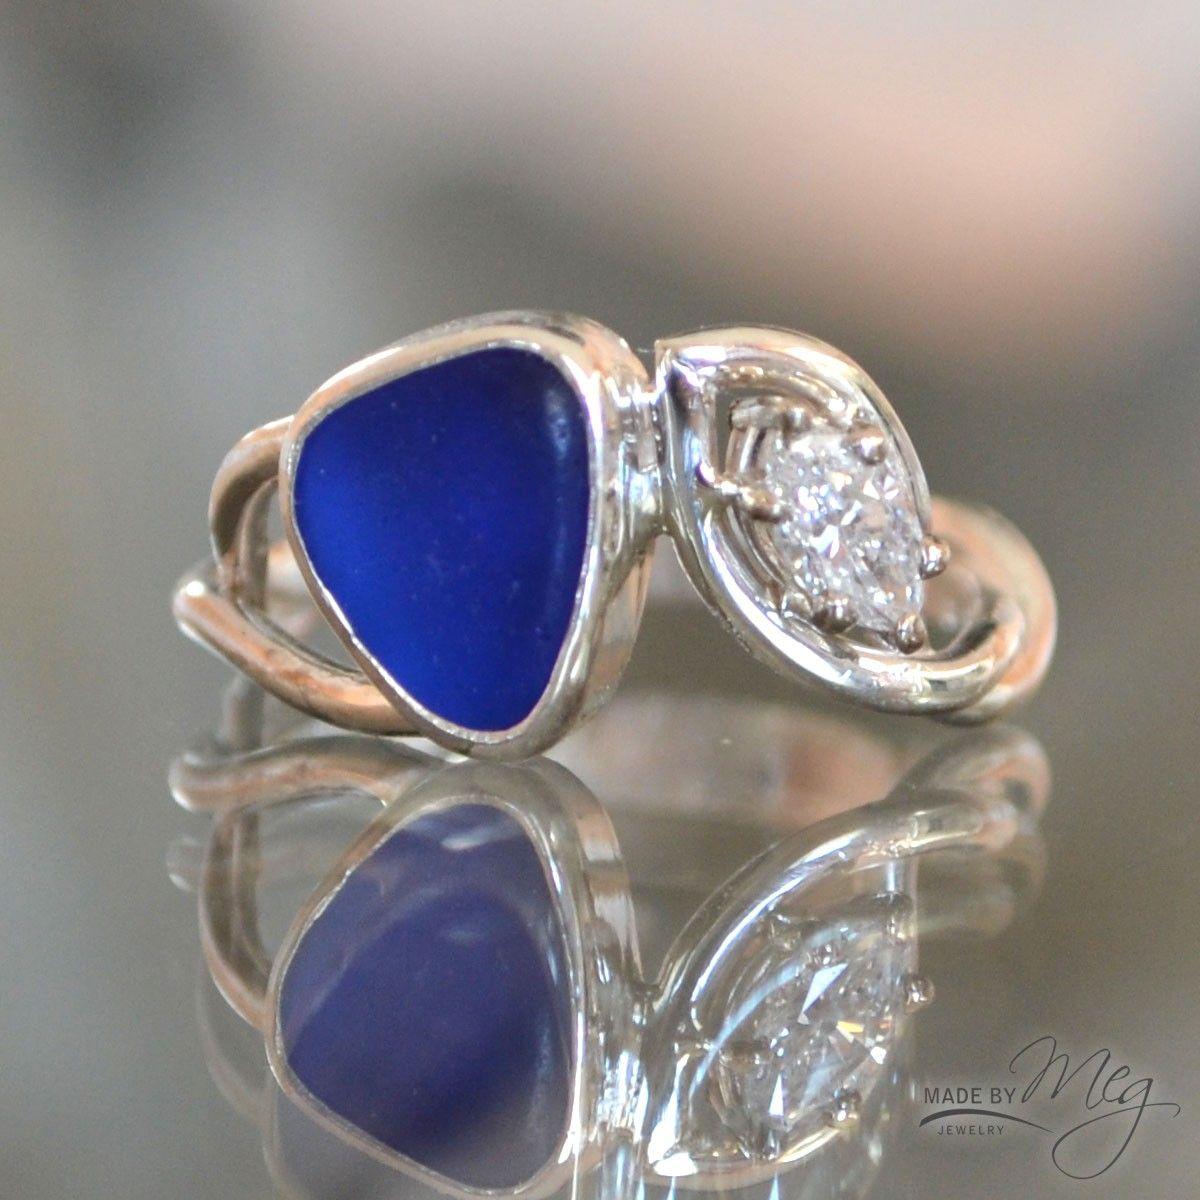 The Norwegian 1 Sea Glass Engagement Ring Jewelry Pinterest